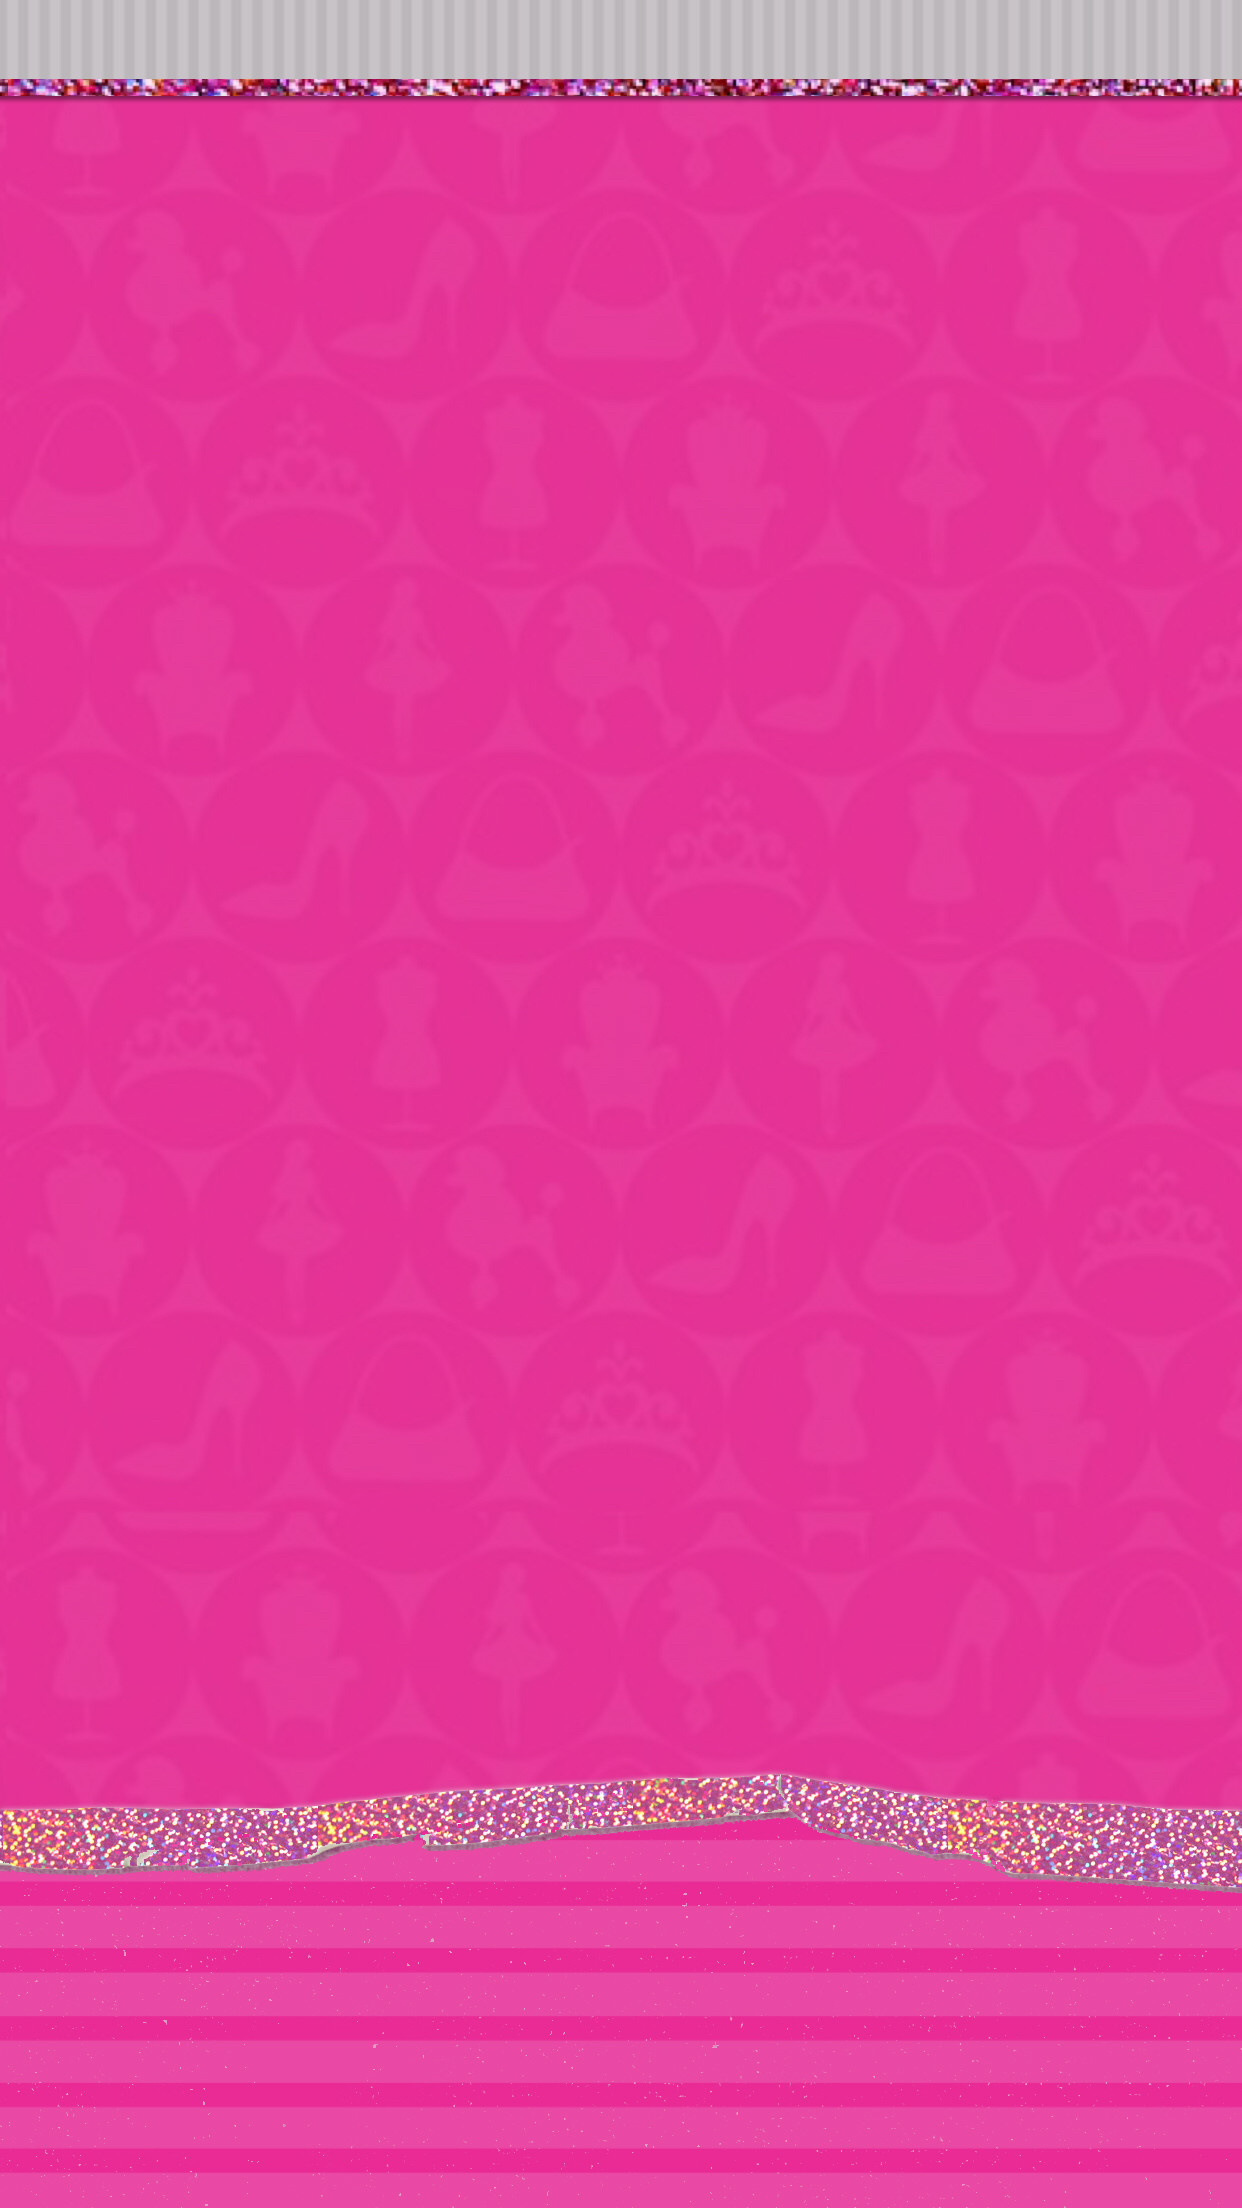 Barbie Pink Background 53 Images